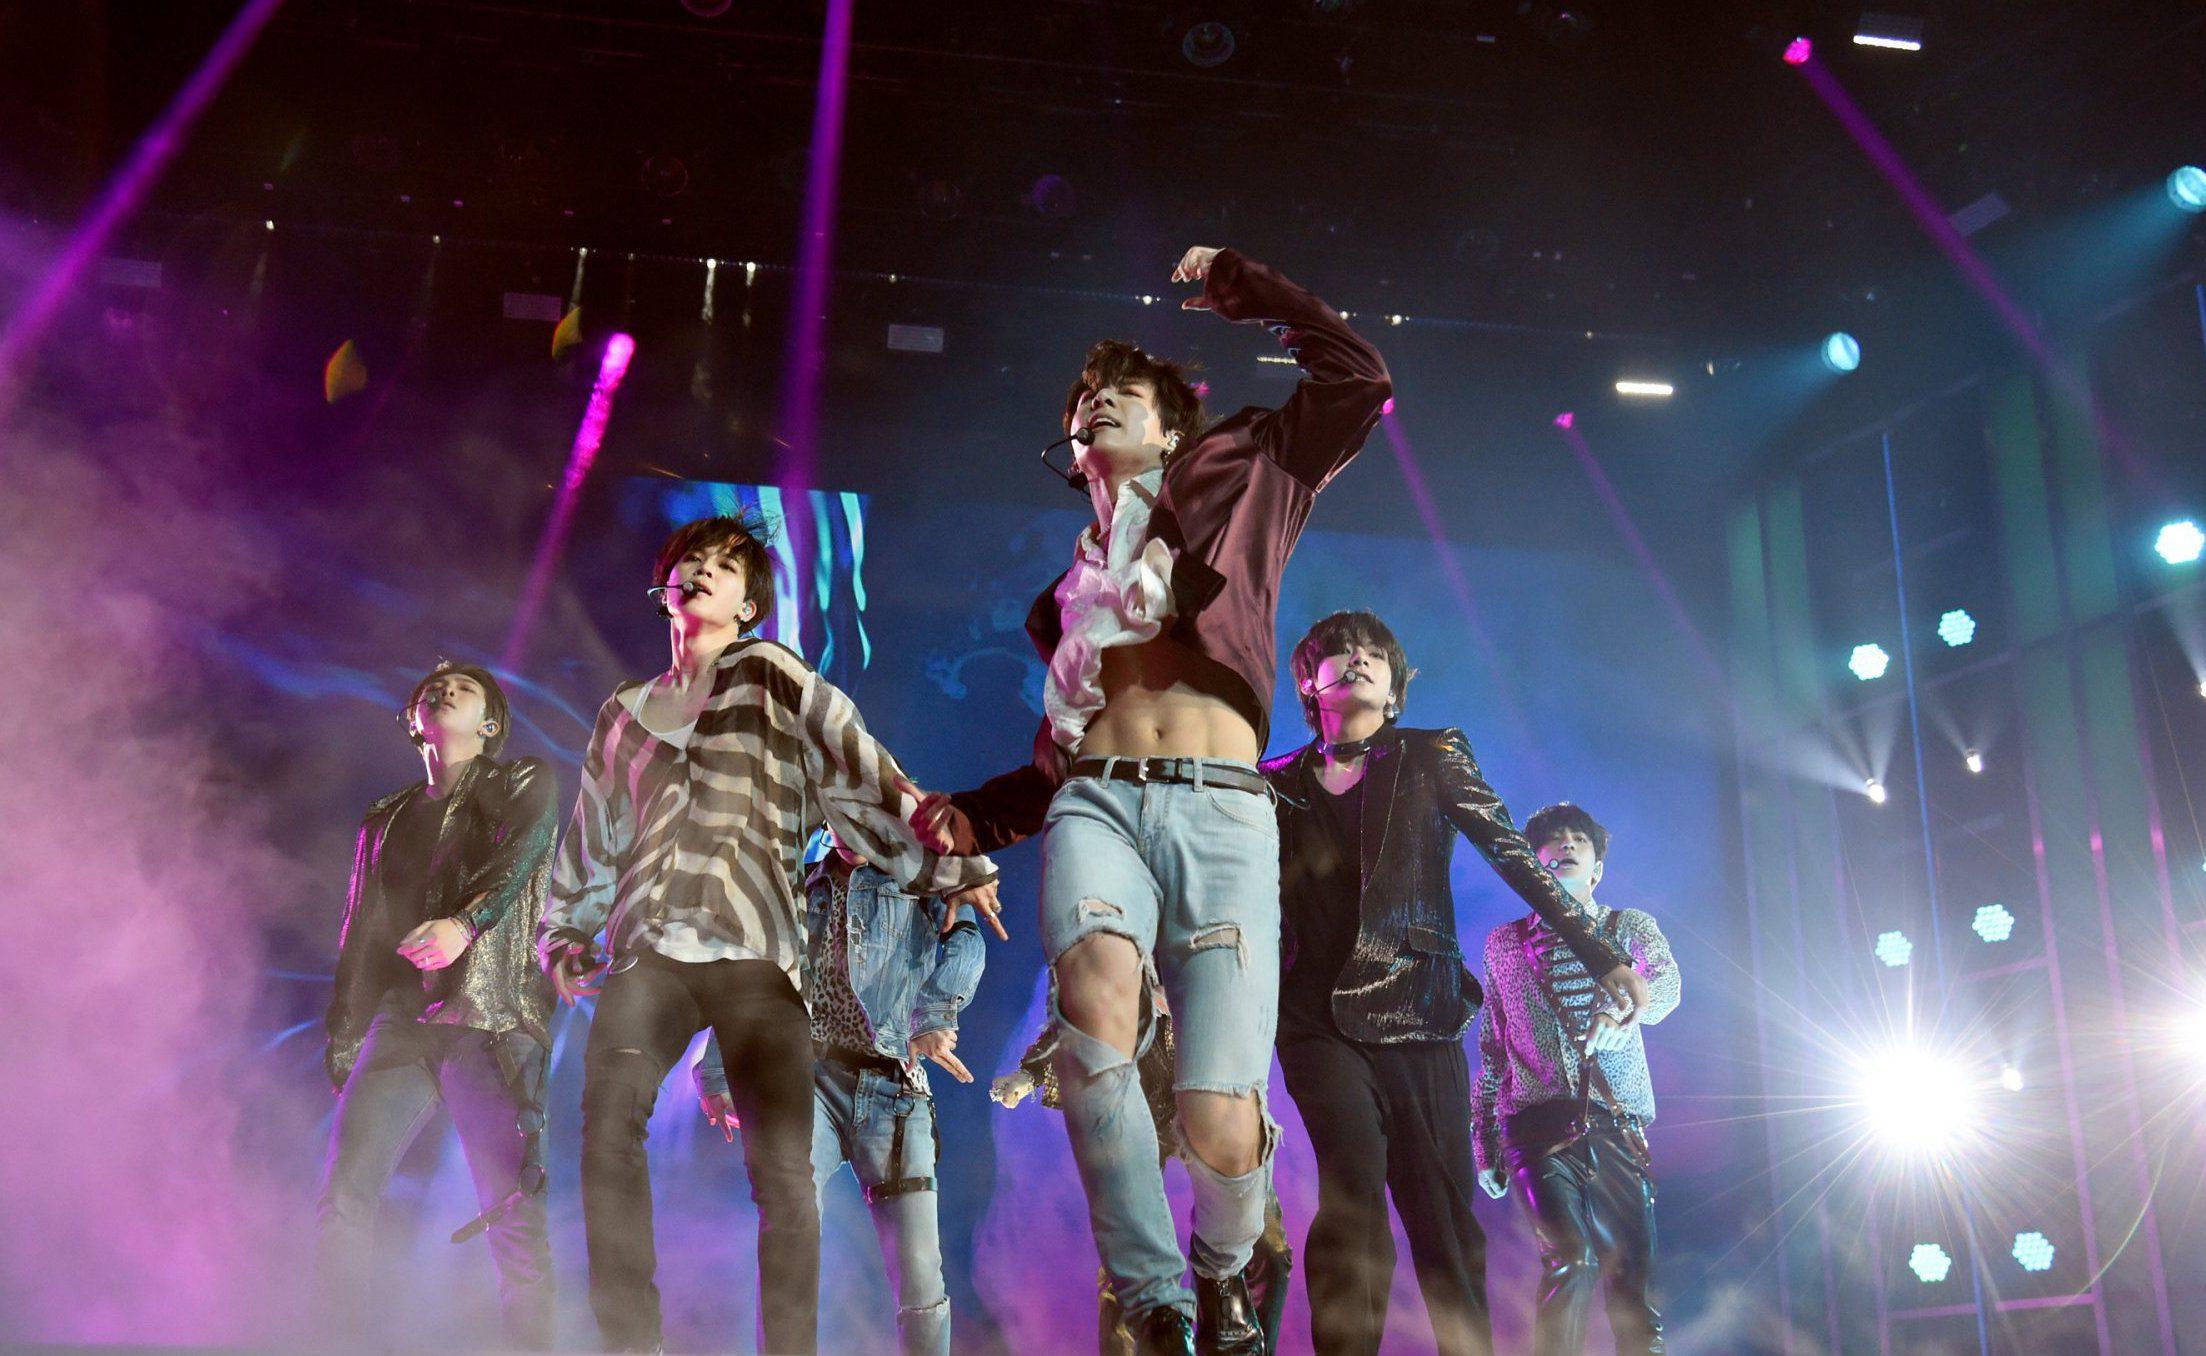 Jungkook flashing his abs at the Billboard Music Awards makes BTS Army lose its collective mind